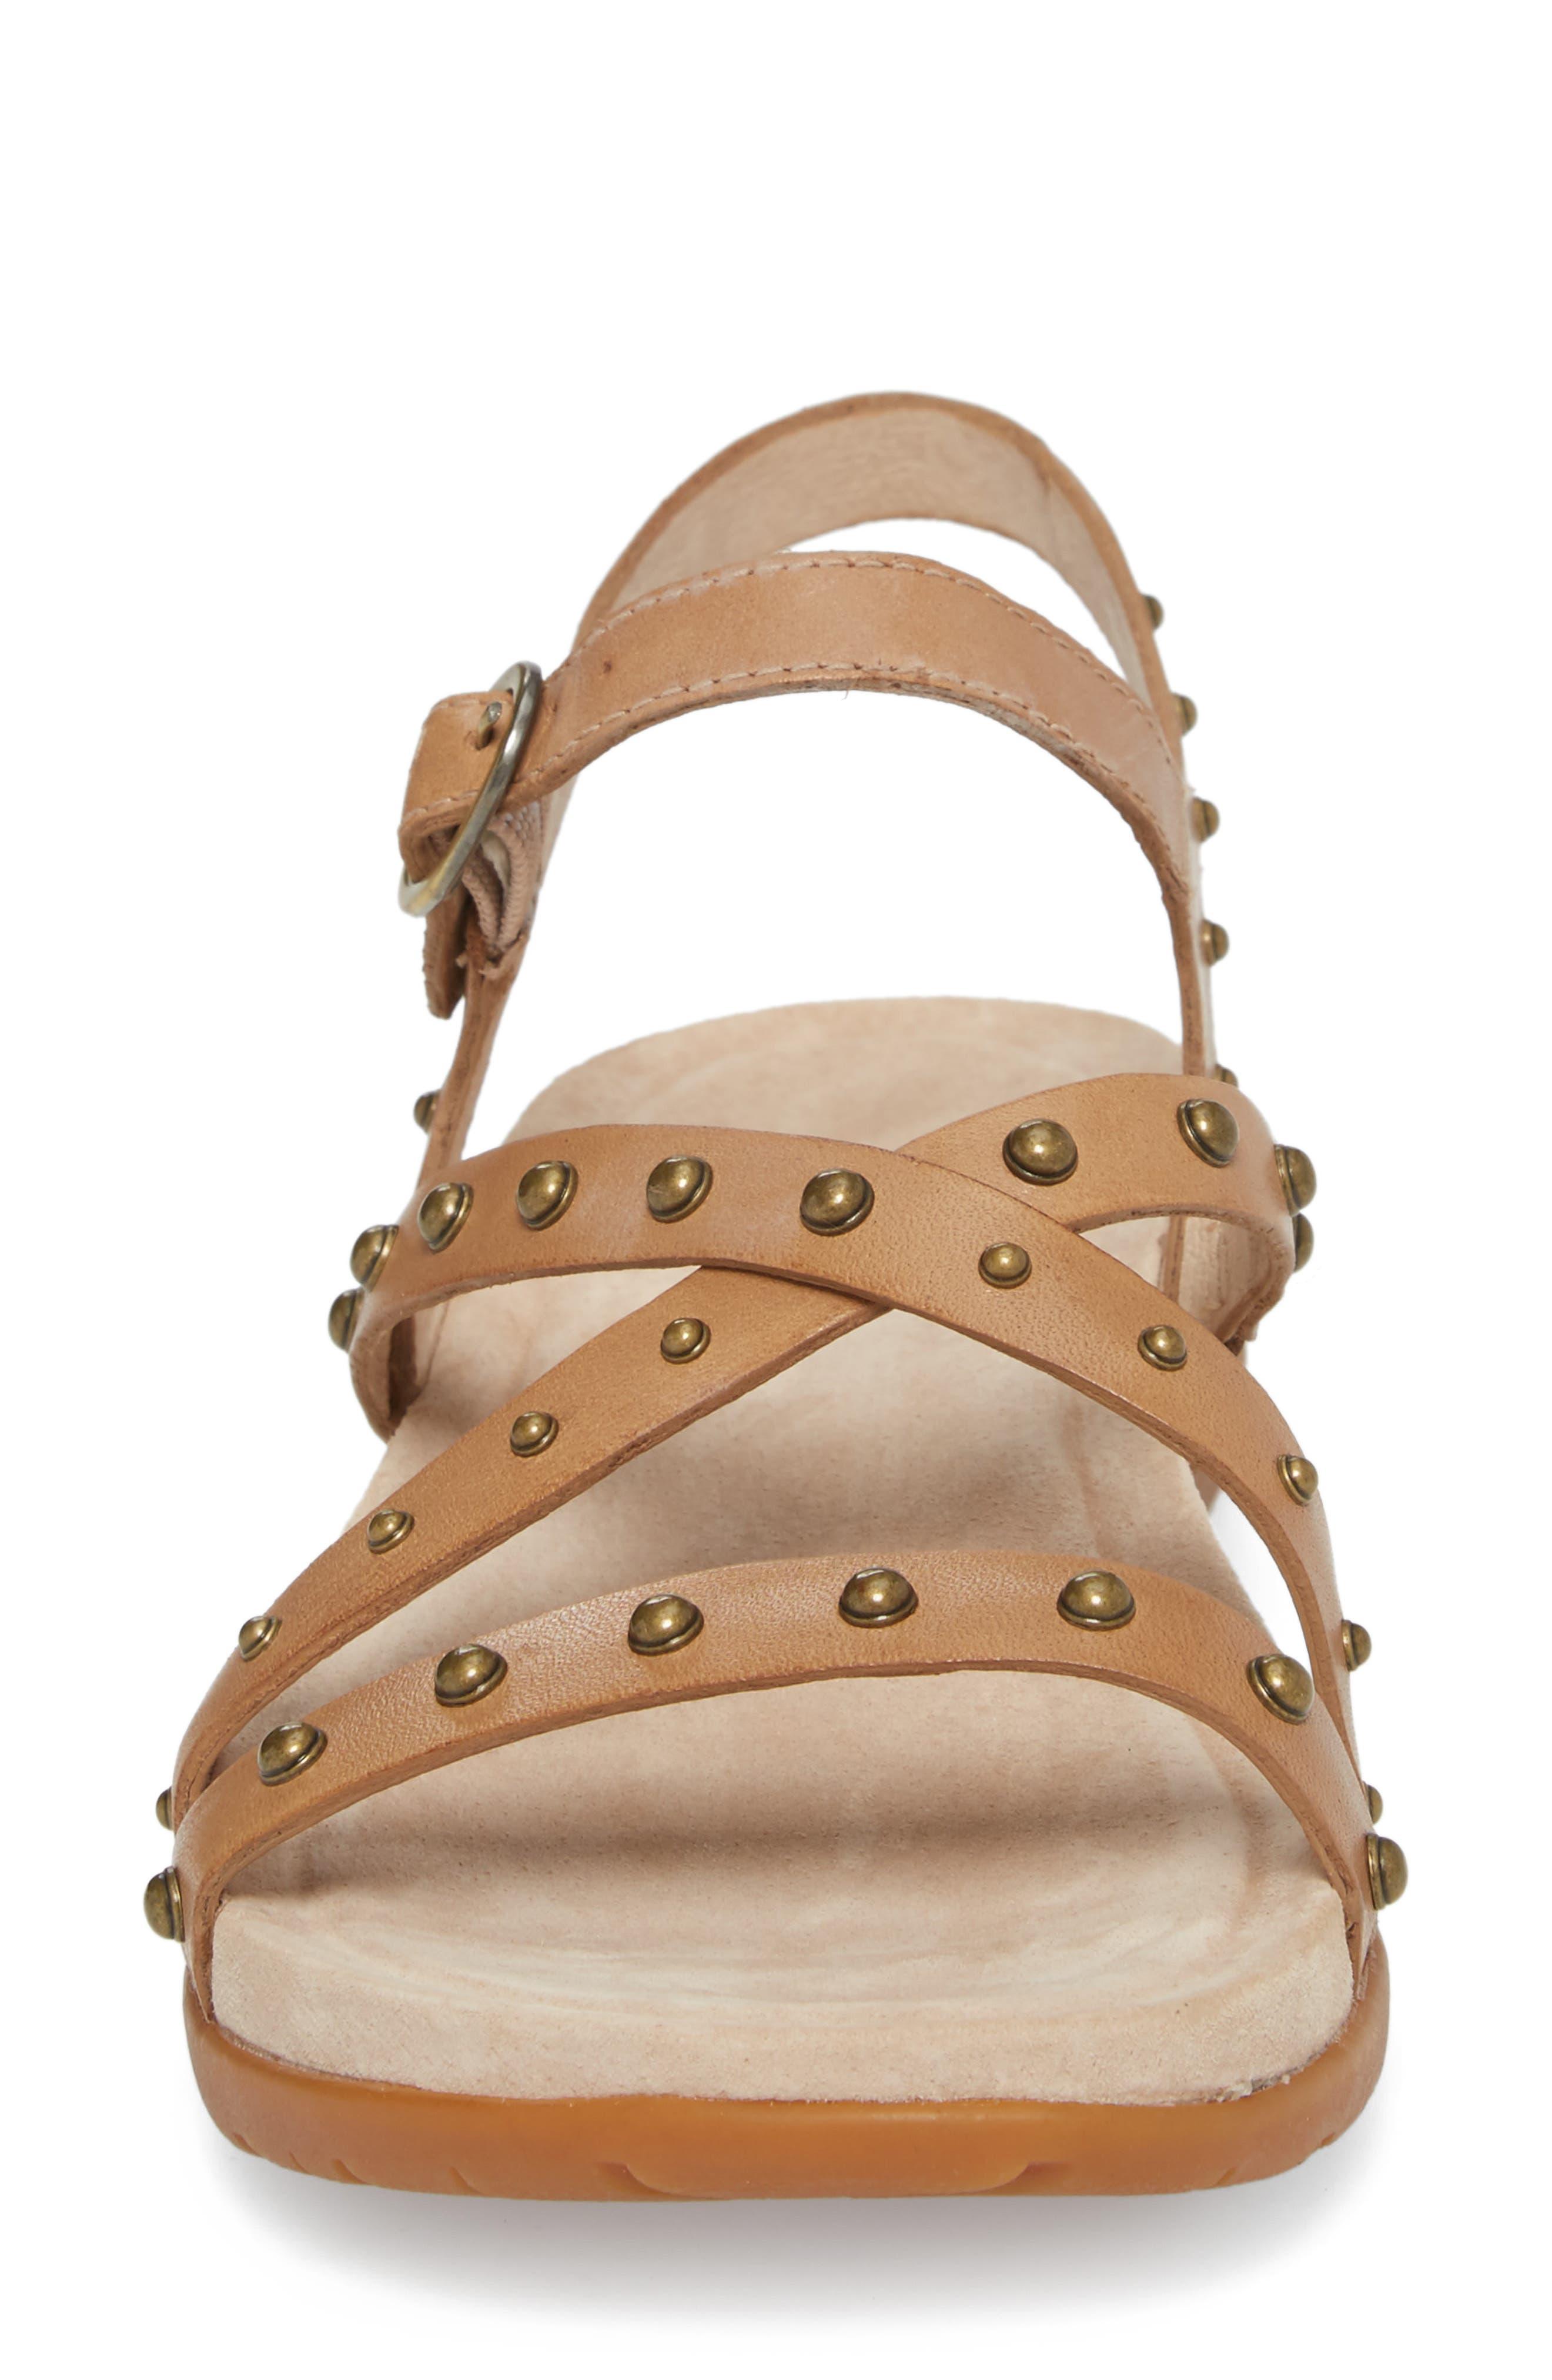 Brigitte Studded Strappy Sandal,                             Alternate thumbnail 4, color,                             Sand Leather